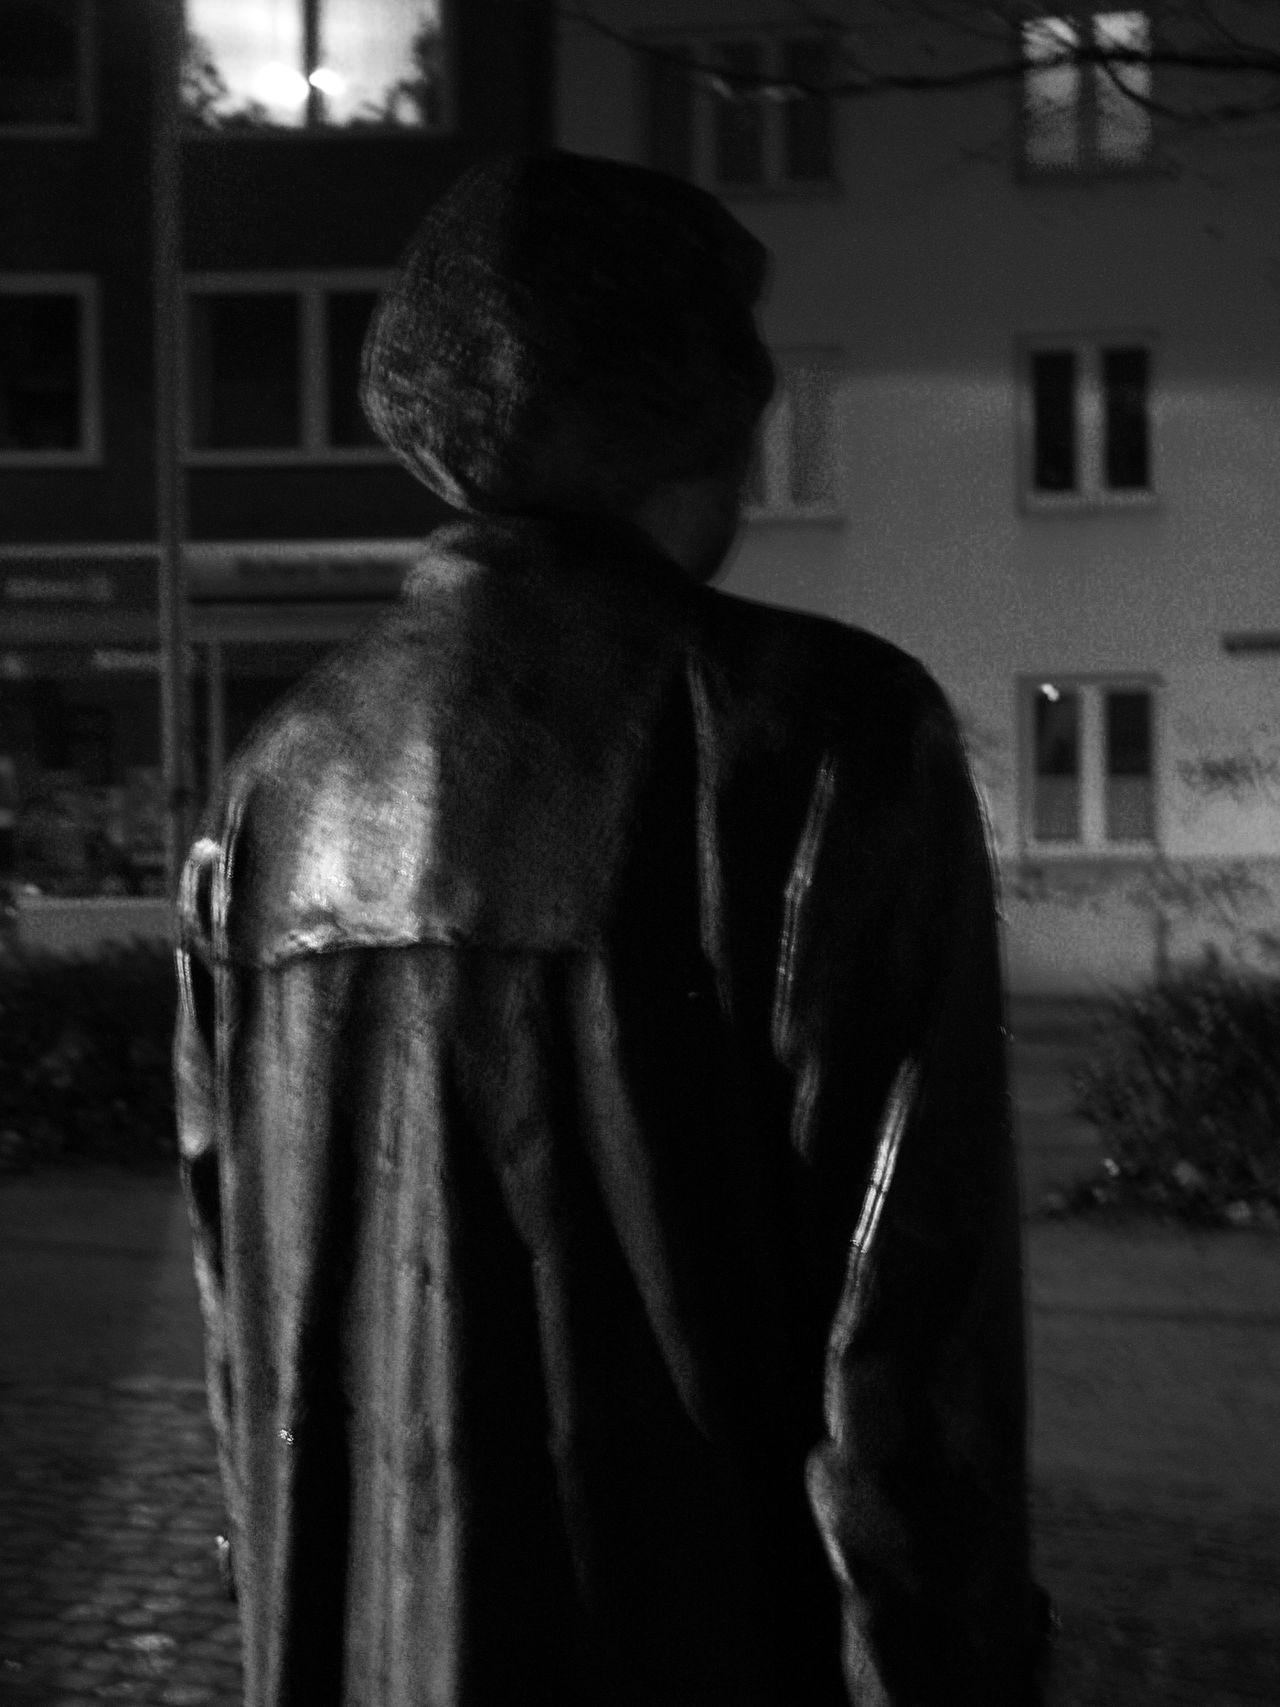 Sculpture Street Art Suermondtplatz Klaus Schmetz Aachen Germany